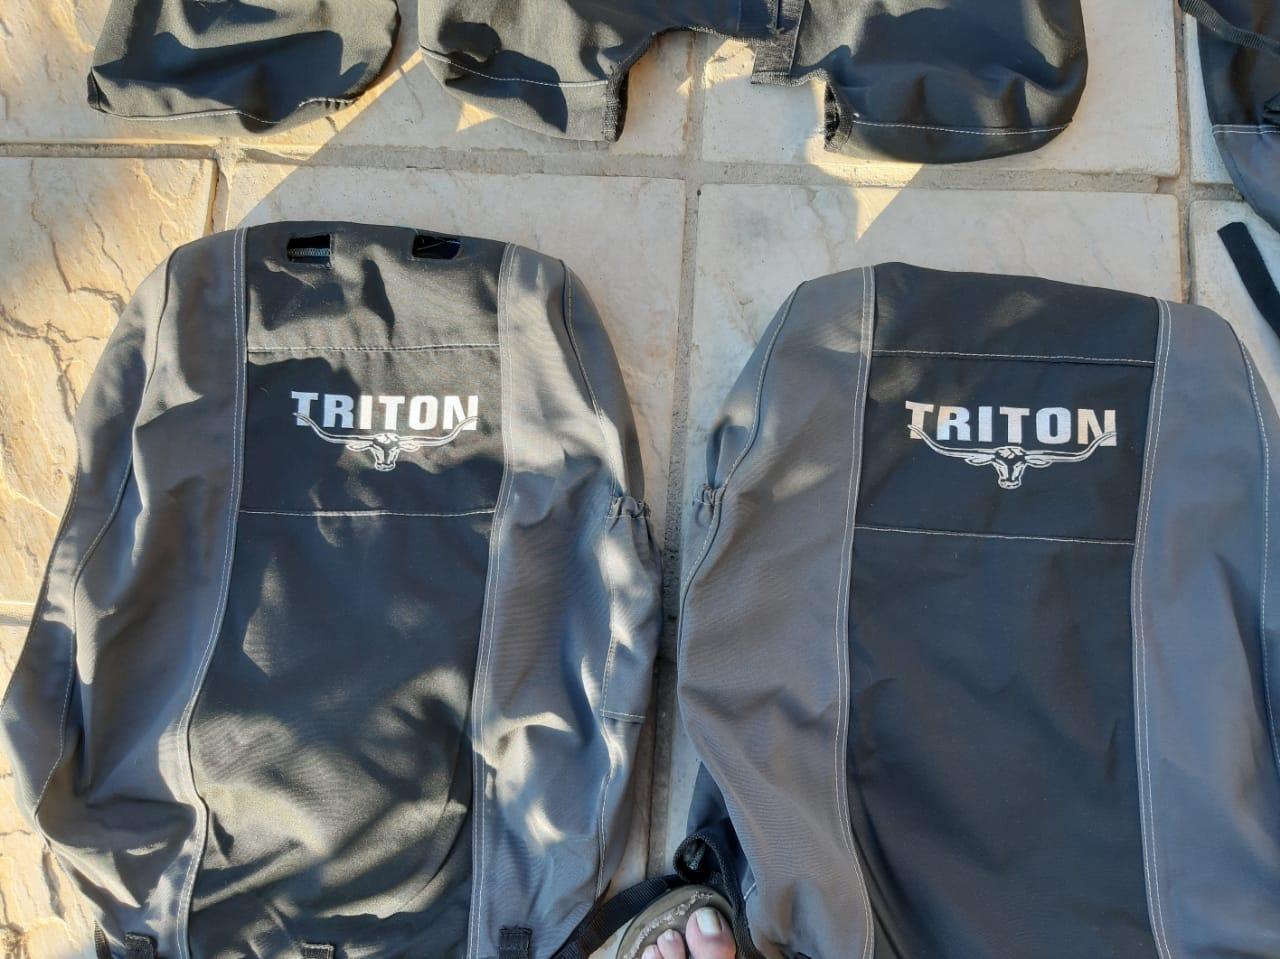 Mitsubishi Triton seat covers